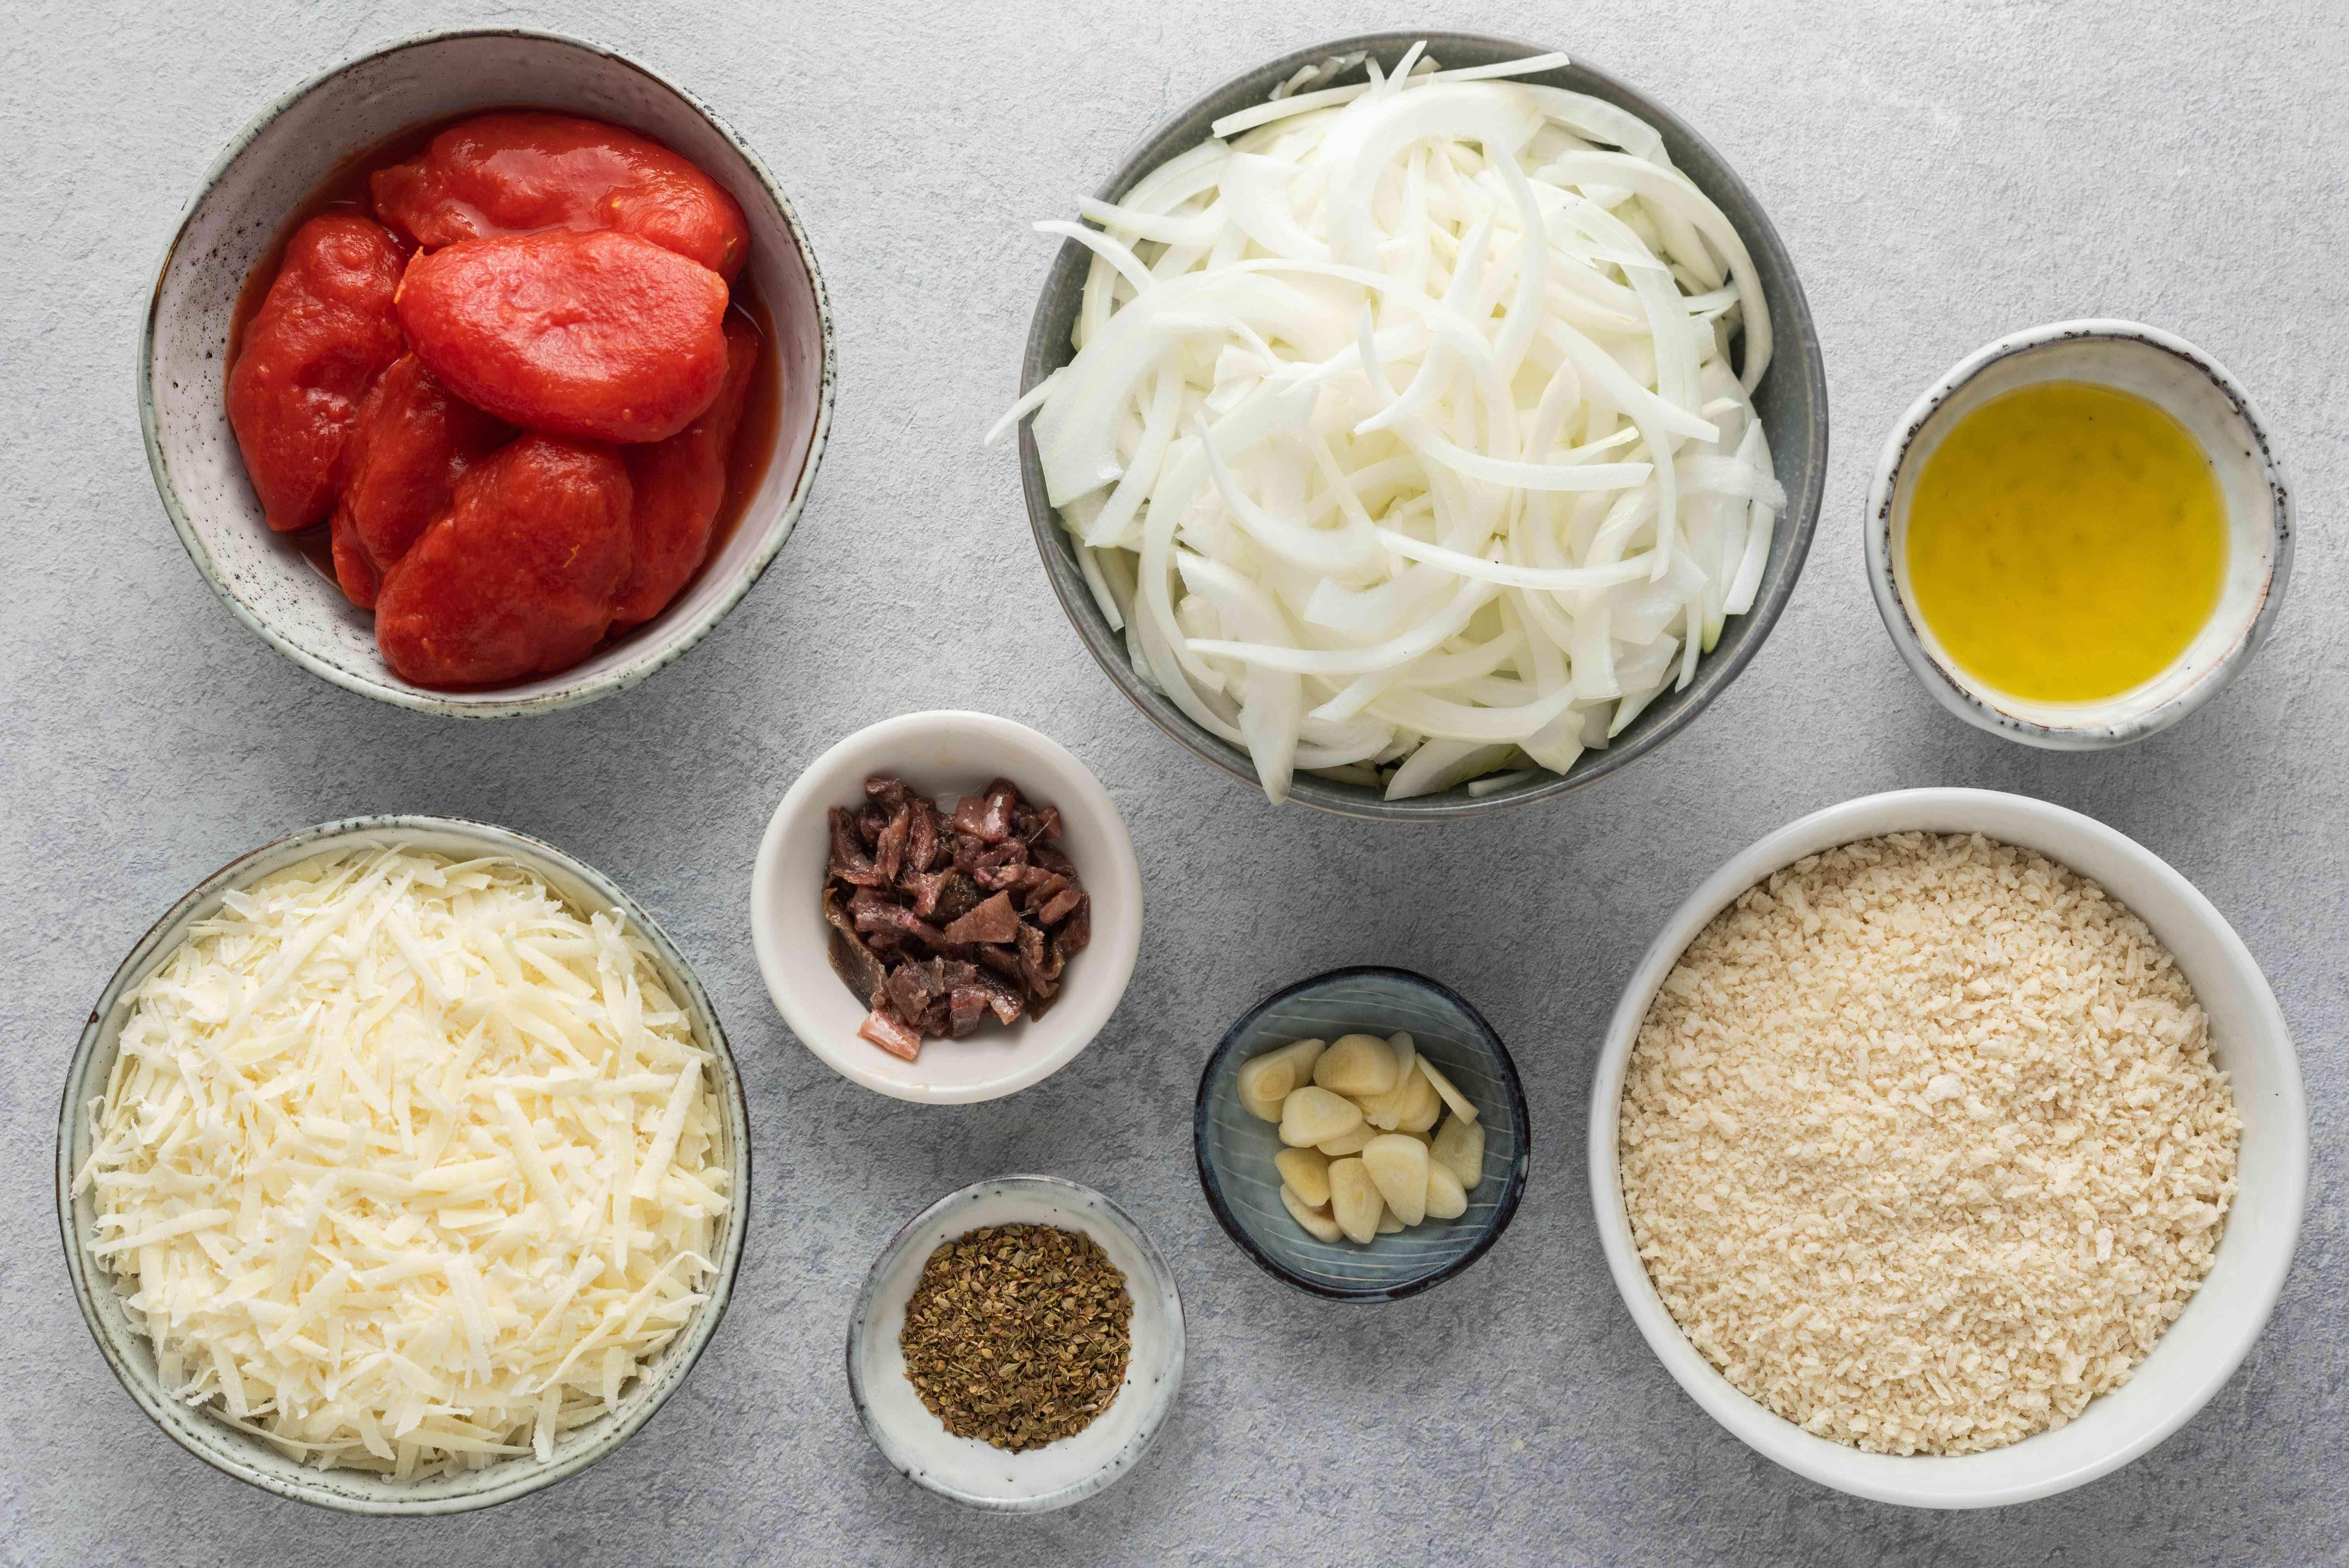 Lo Sfincione, The Original Sicilian-Style Pizza, toppings ingredients